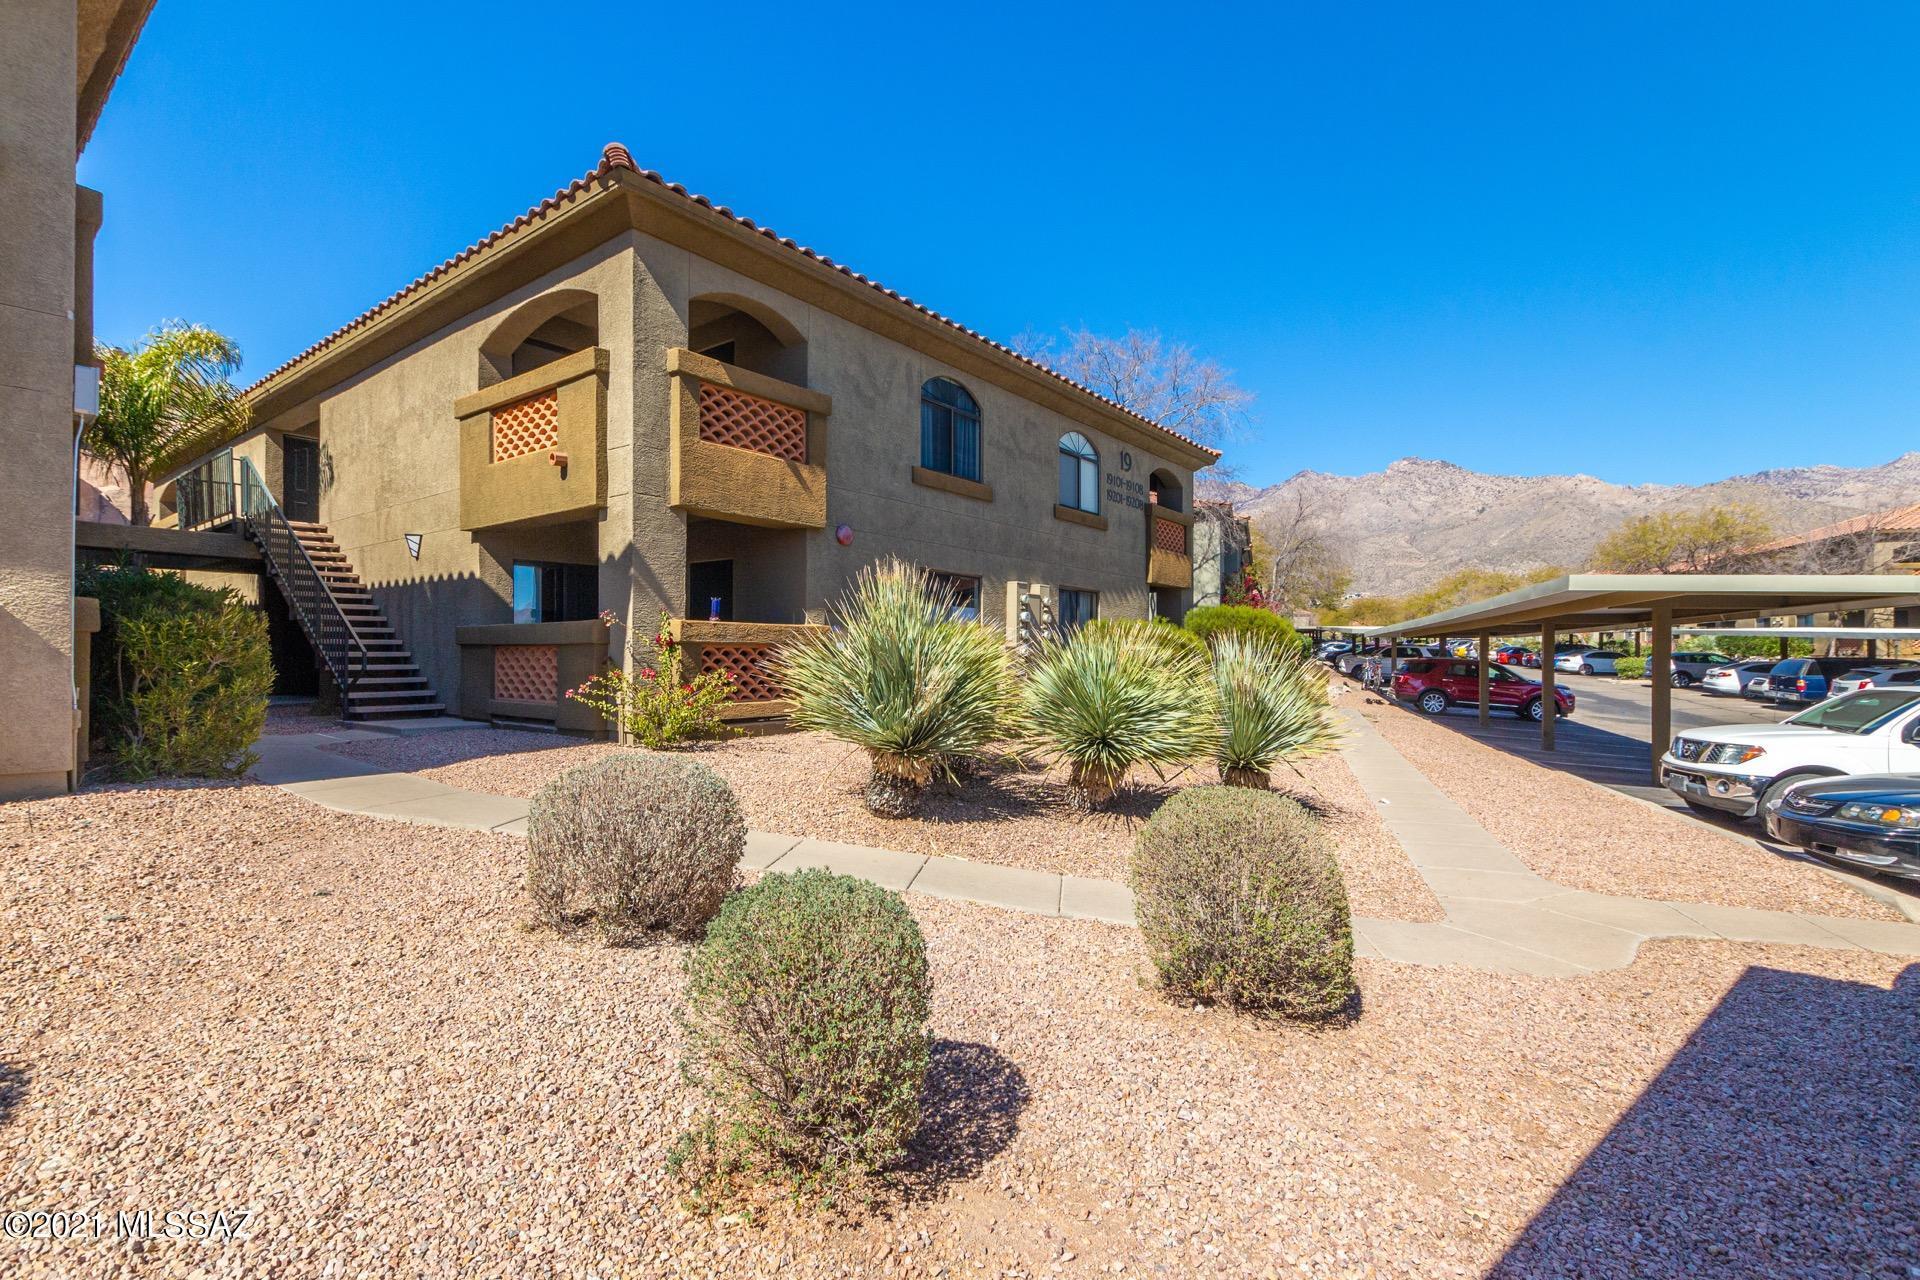 Photo of 5751 N Kolb Road, Tucson, AZ 85750